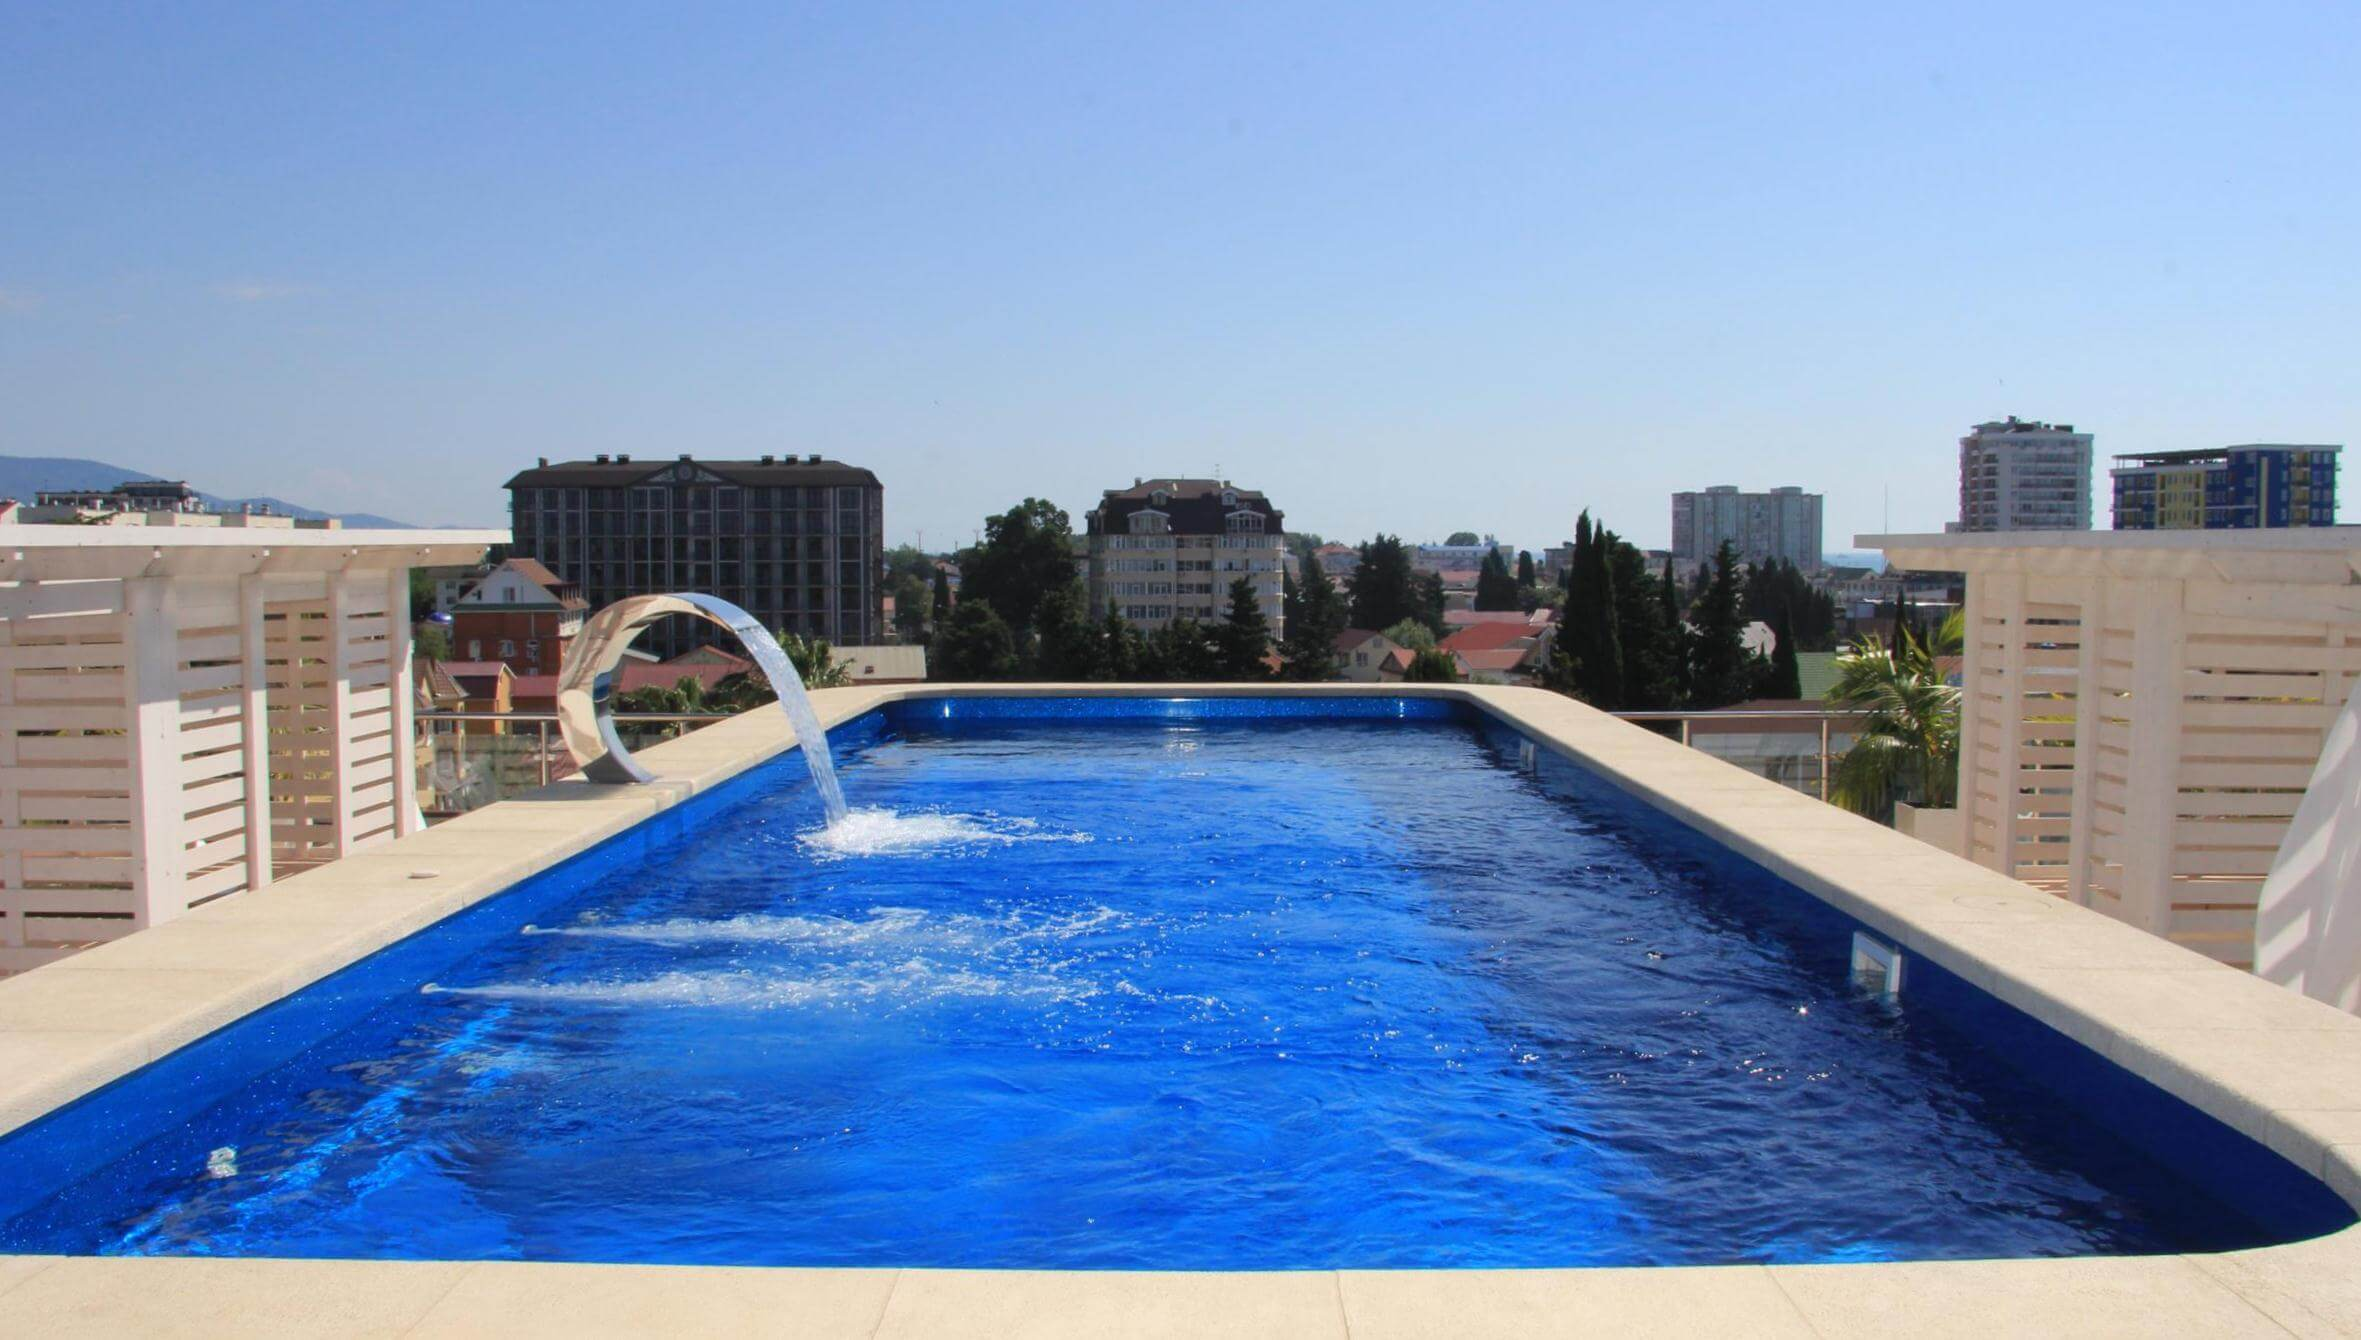 Фото бассейна в апарт-отеле Форвард в Адлере